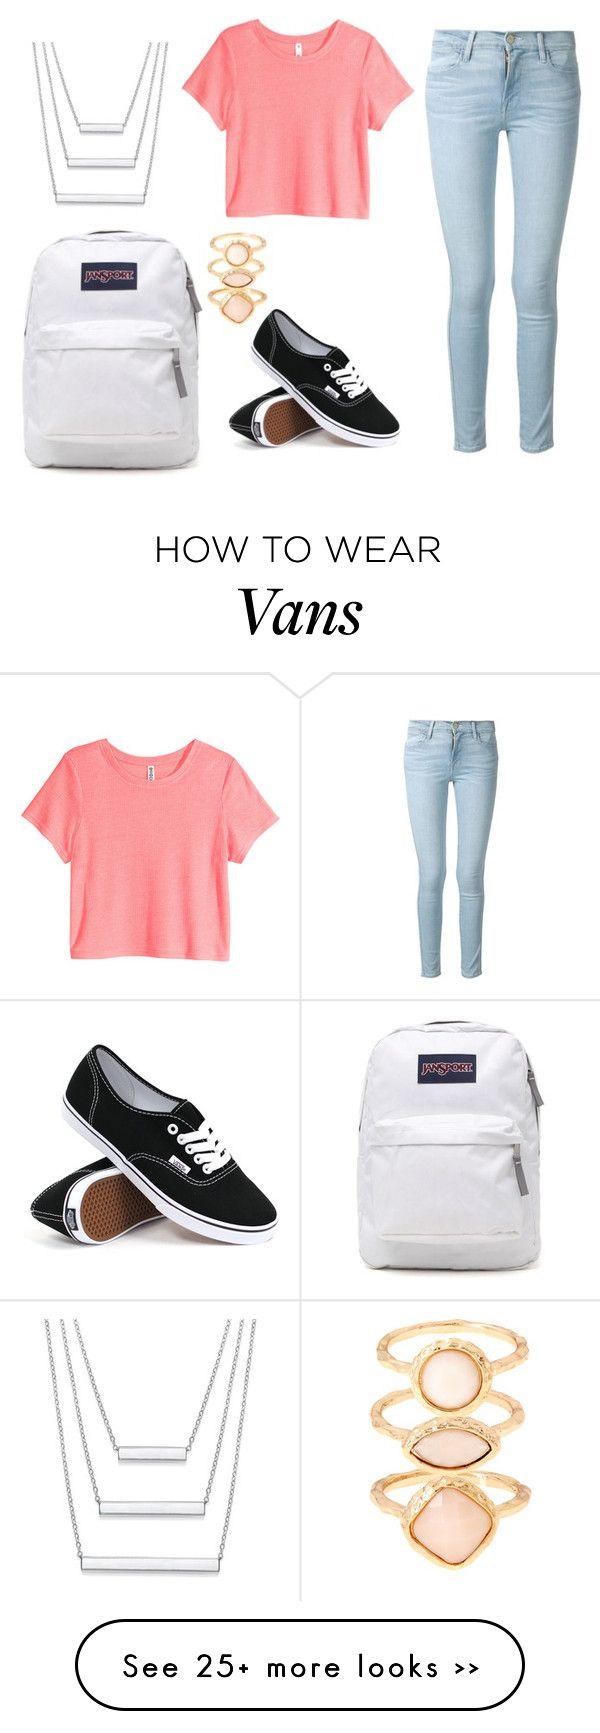 pantalon + zapatillas